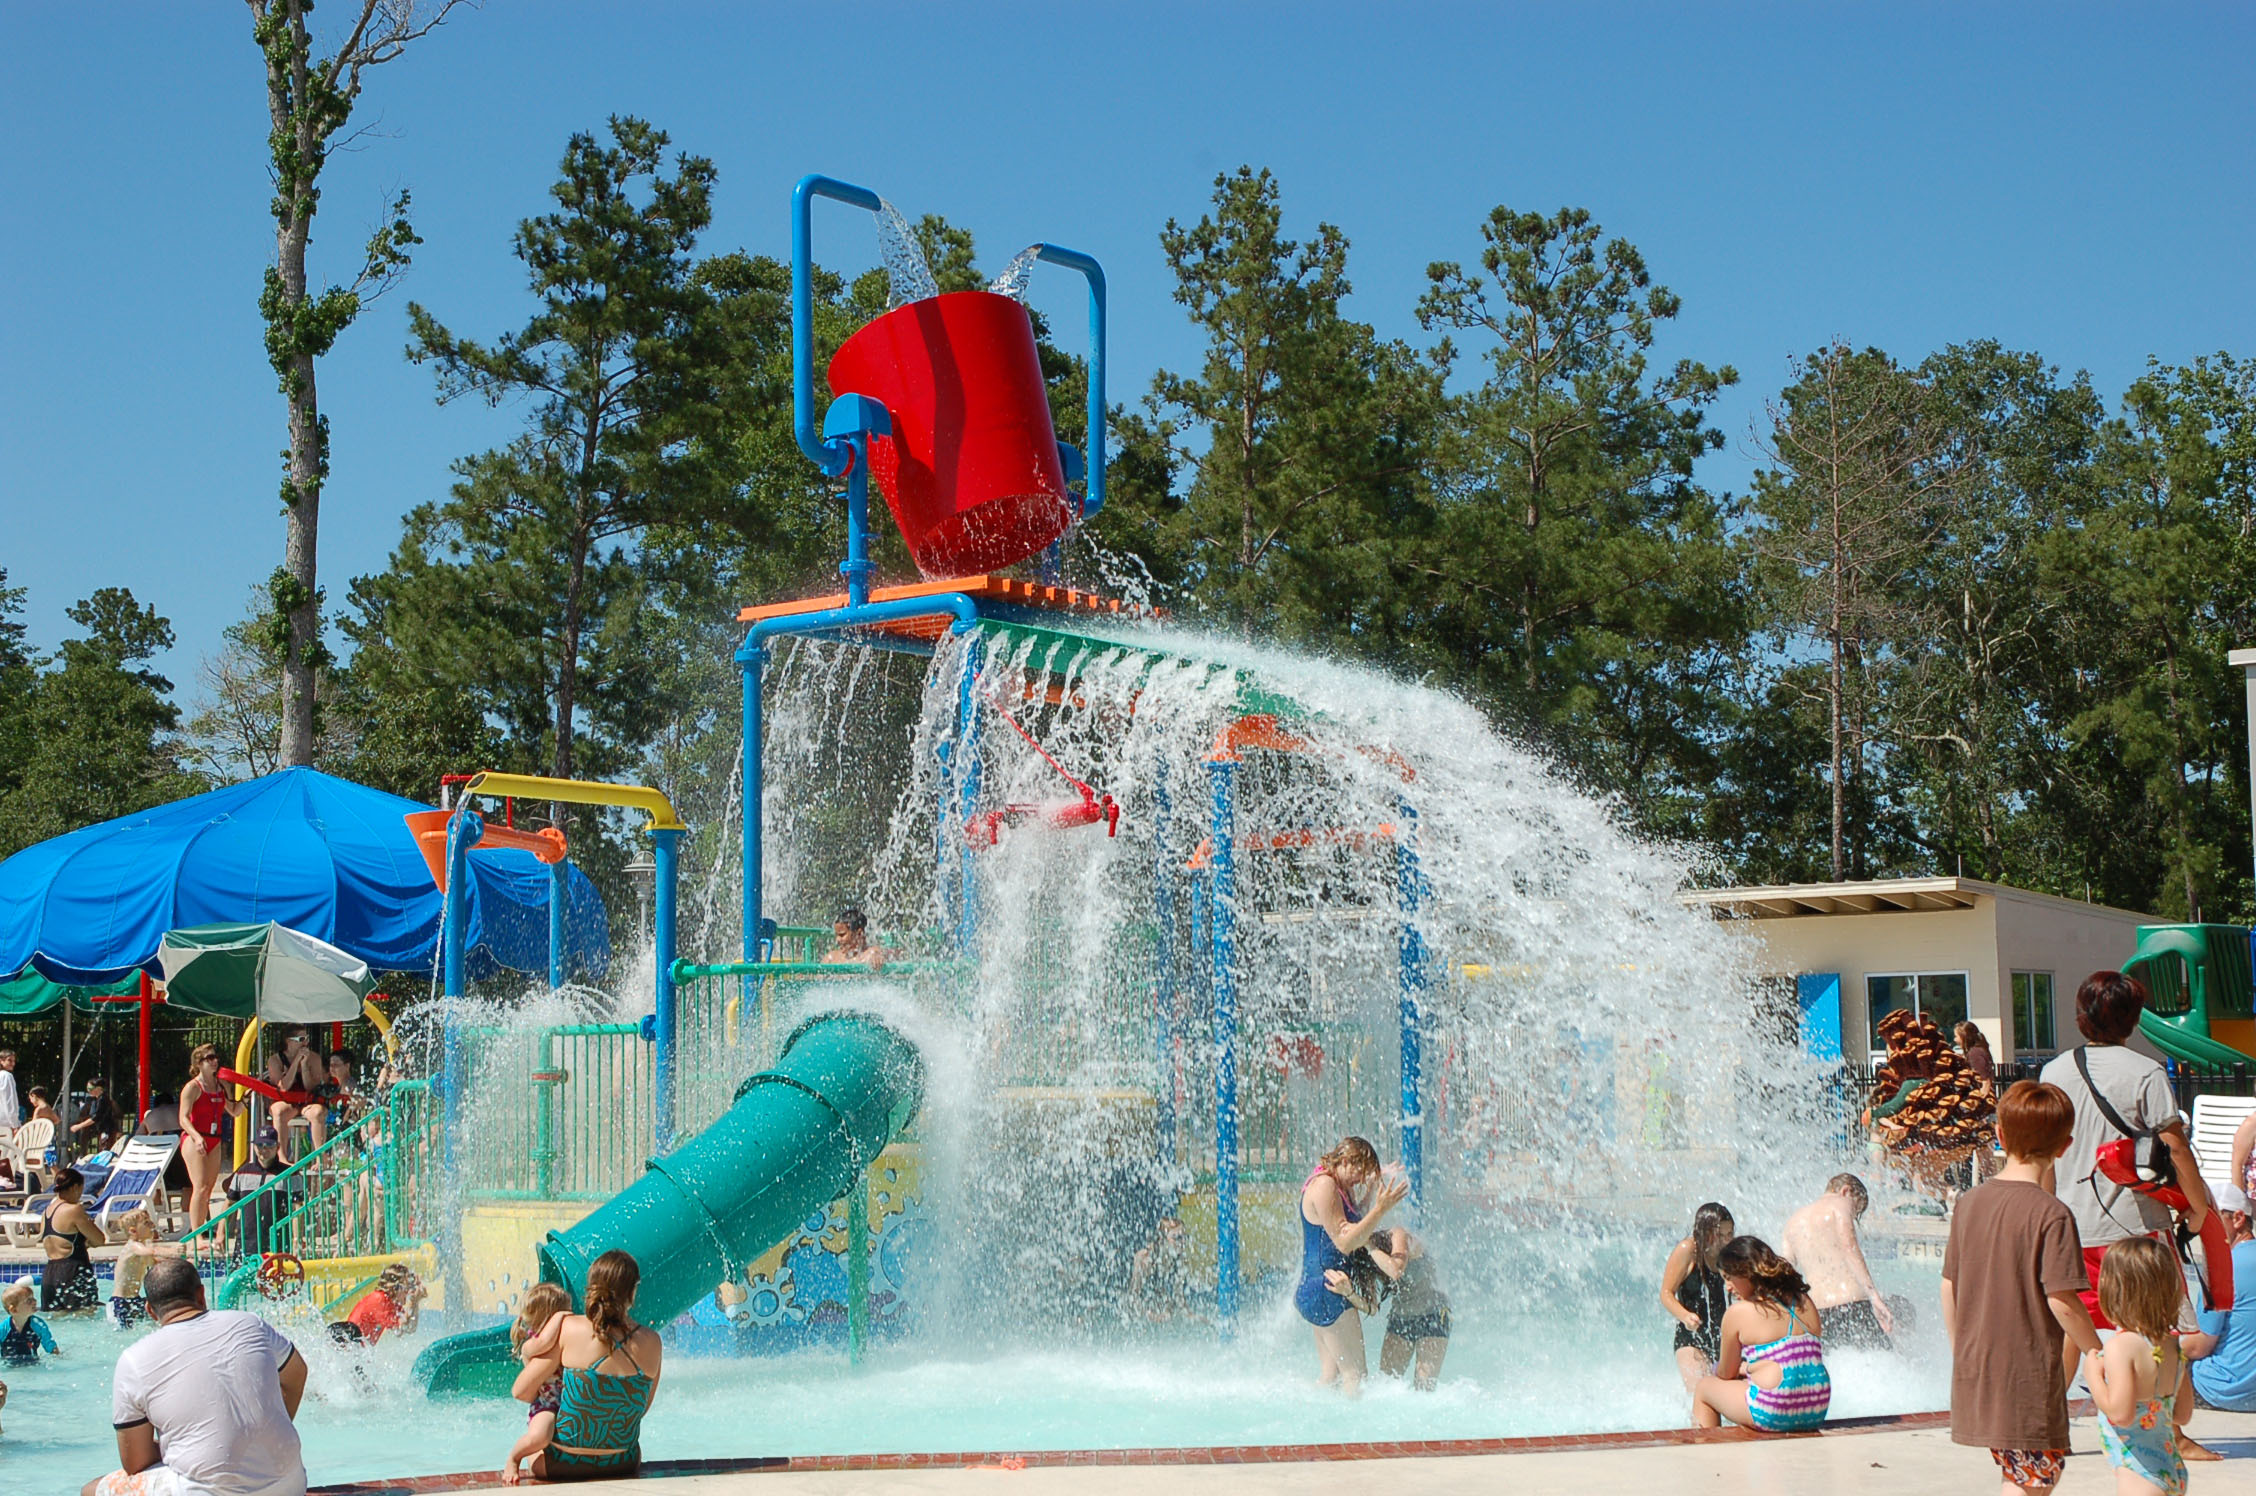 splash pools u0026 waterparks in the woodlands woodlands relo group